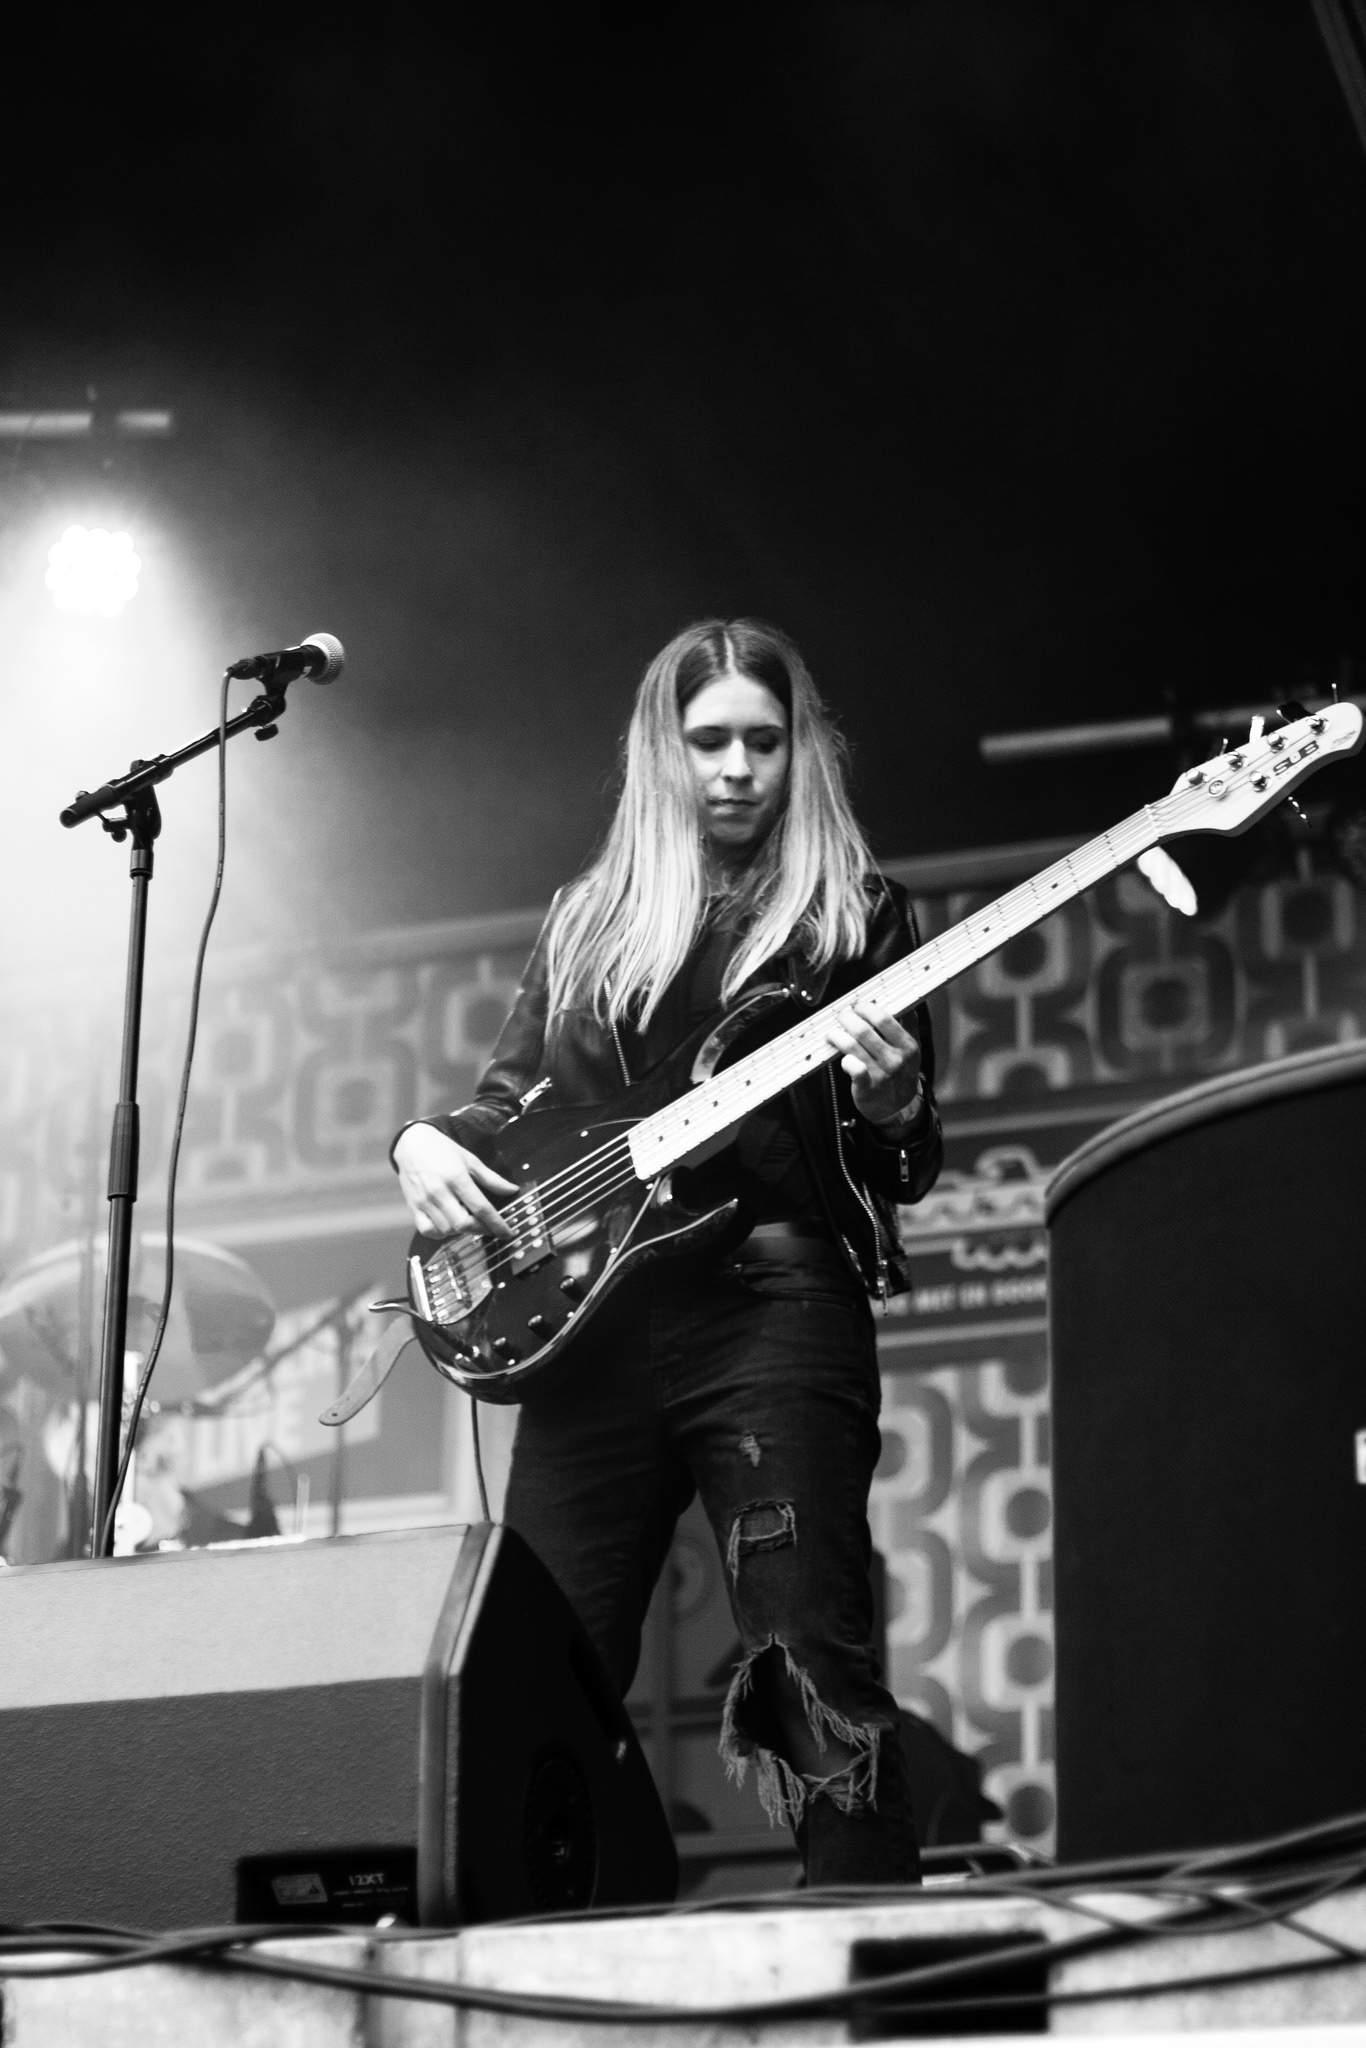 luminize8 Luminize at The Life I Live Festival in Den Haag 2016